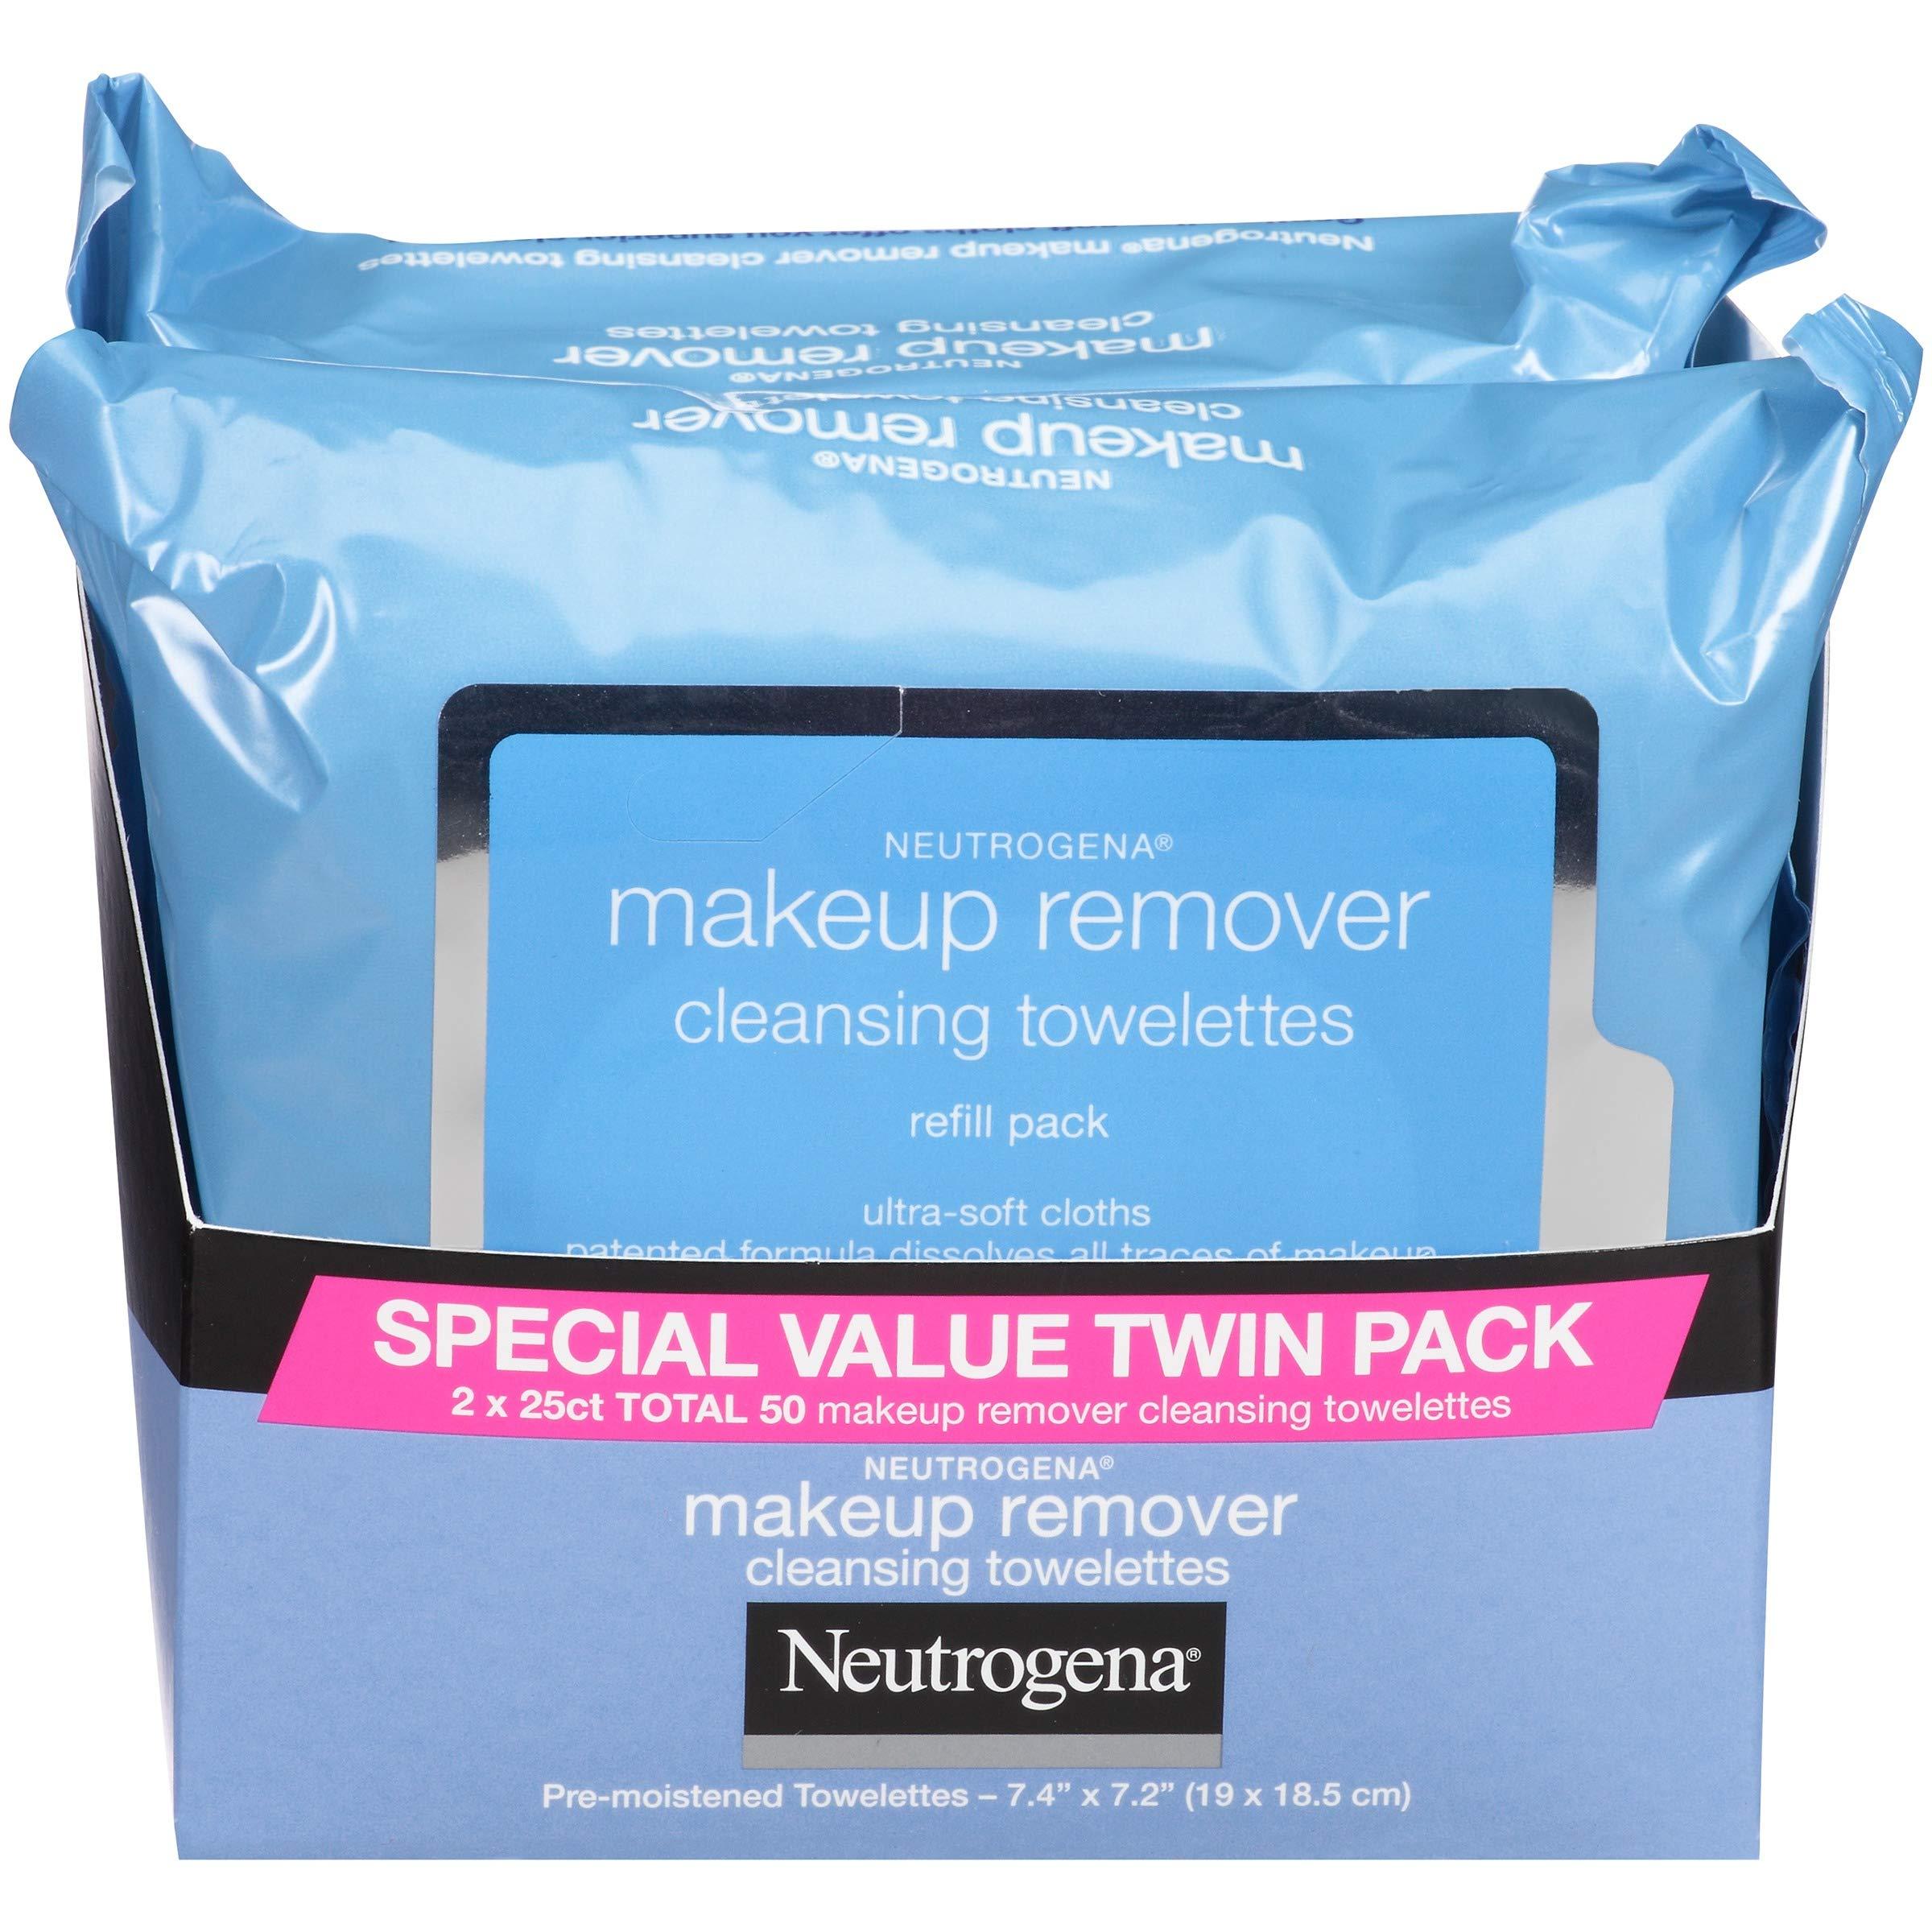 Ntg Makeup Rmvr Clnsng Twlt 25s Rfl Twpk product image